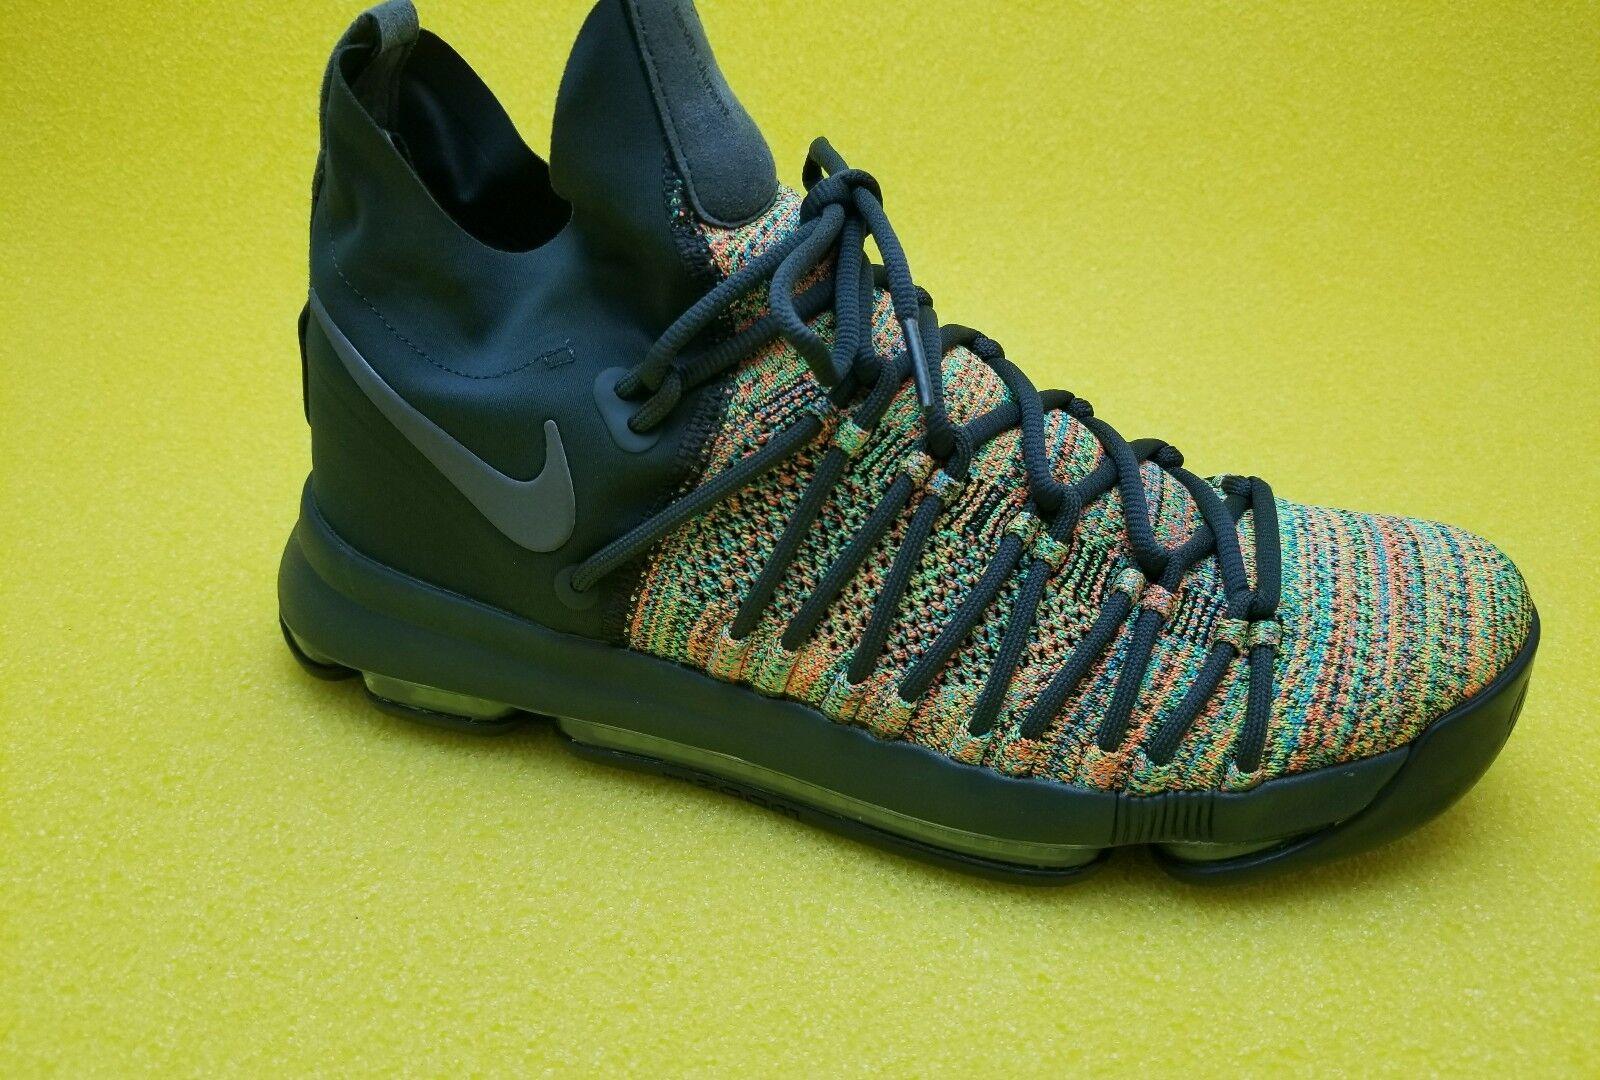 Nike zoom kd - 9 - elite multi lmtd multi elite - schwarze farbe 909438-900 krieger kevin durant kd9 f6a0ae